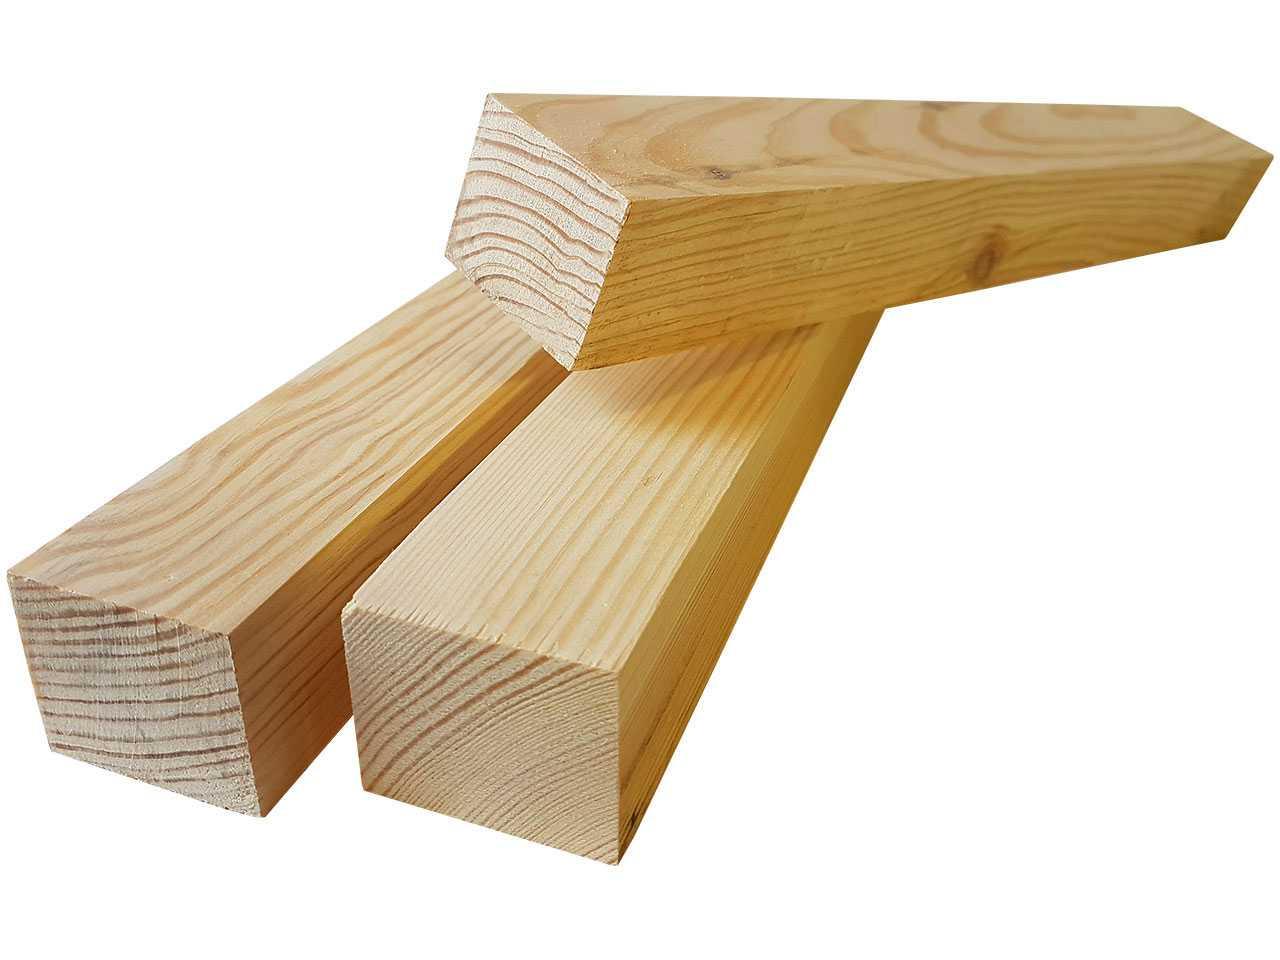 Брус для каркаса лавок из xвойныx пород дерева 40x50 мм